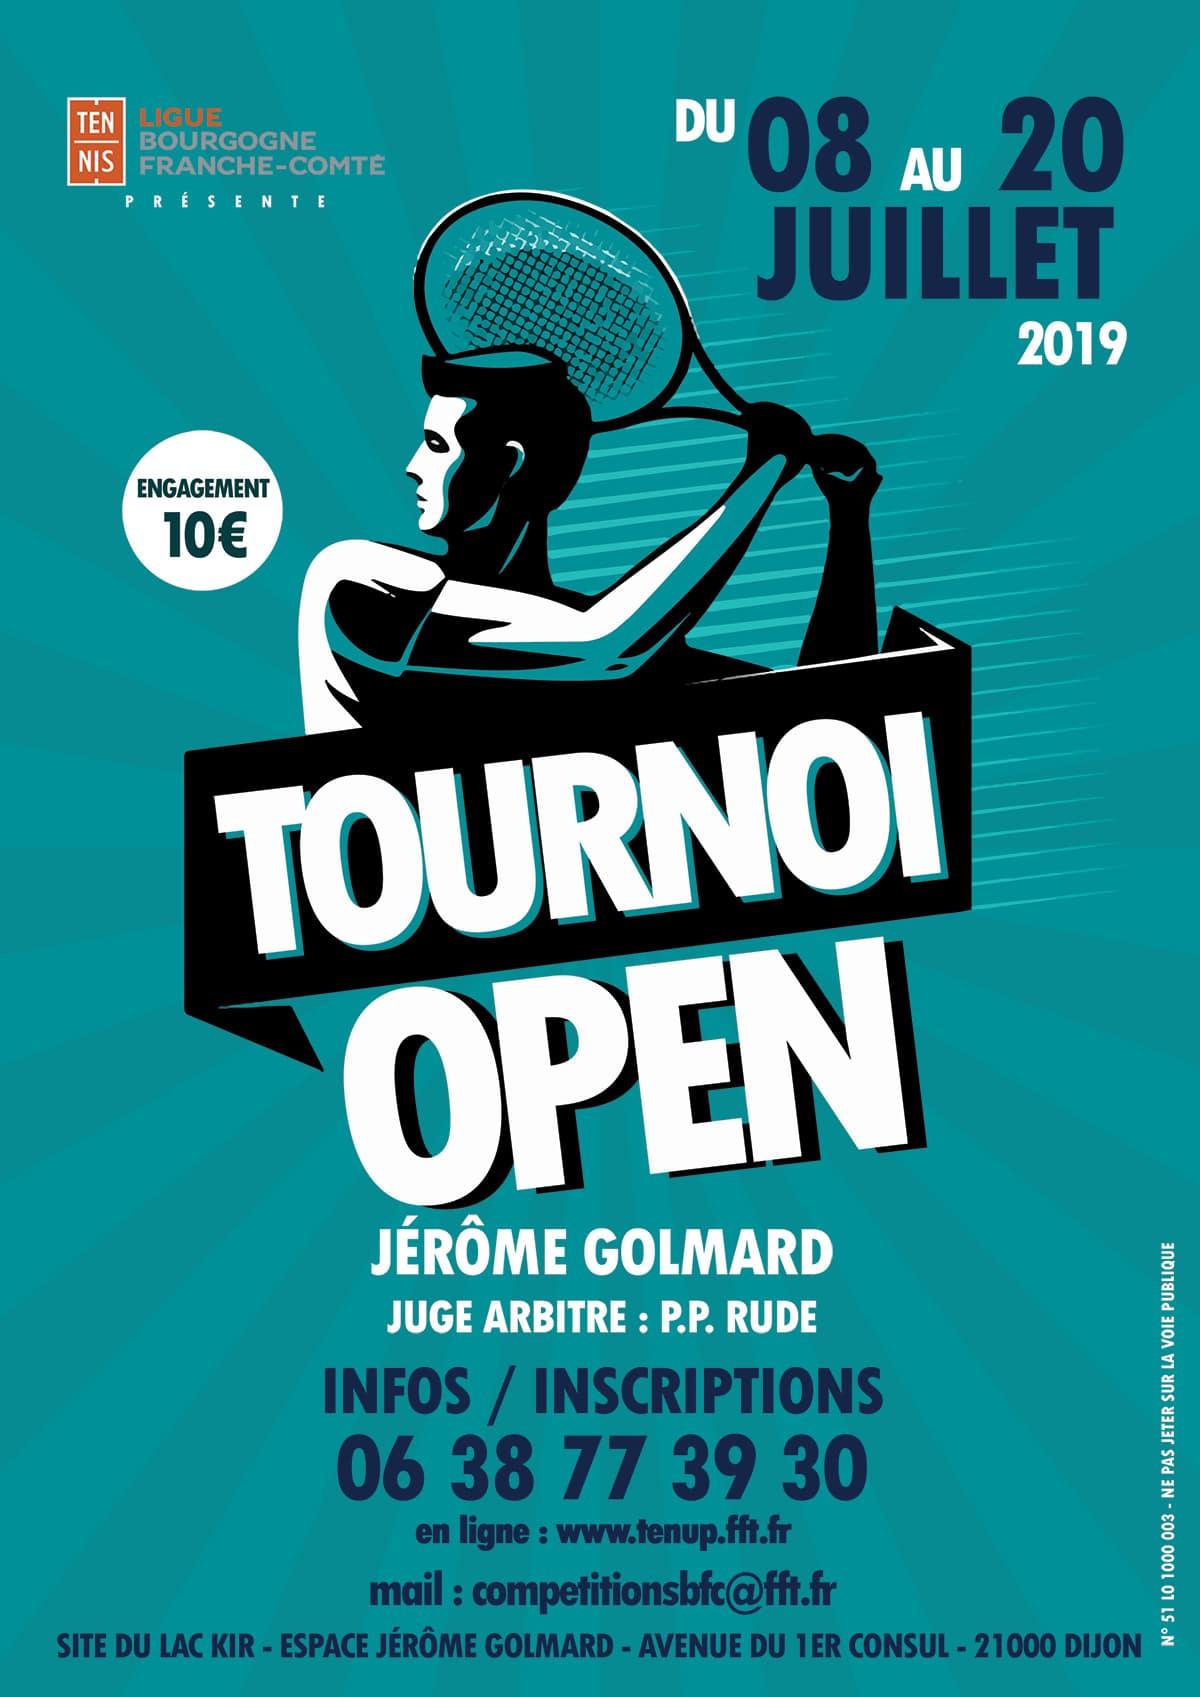 Tournoi Open Jérôme GOLMARD Dijon Lac Kir